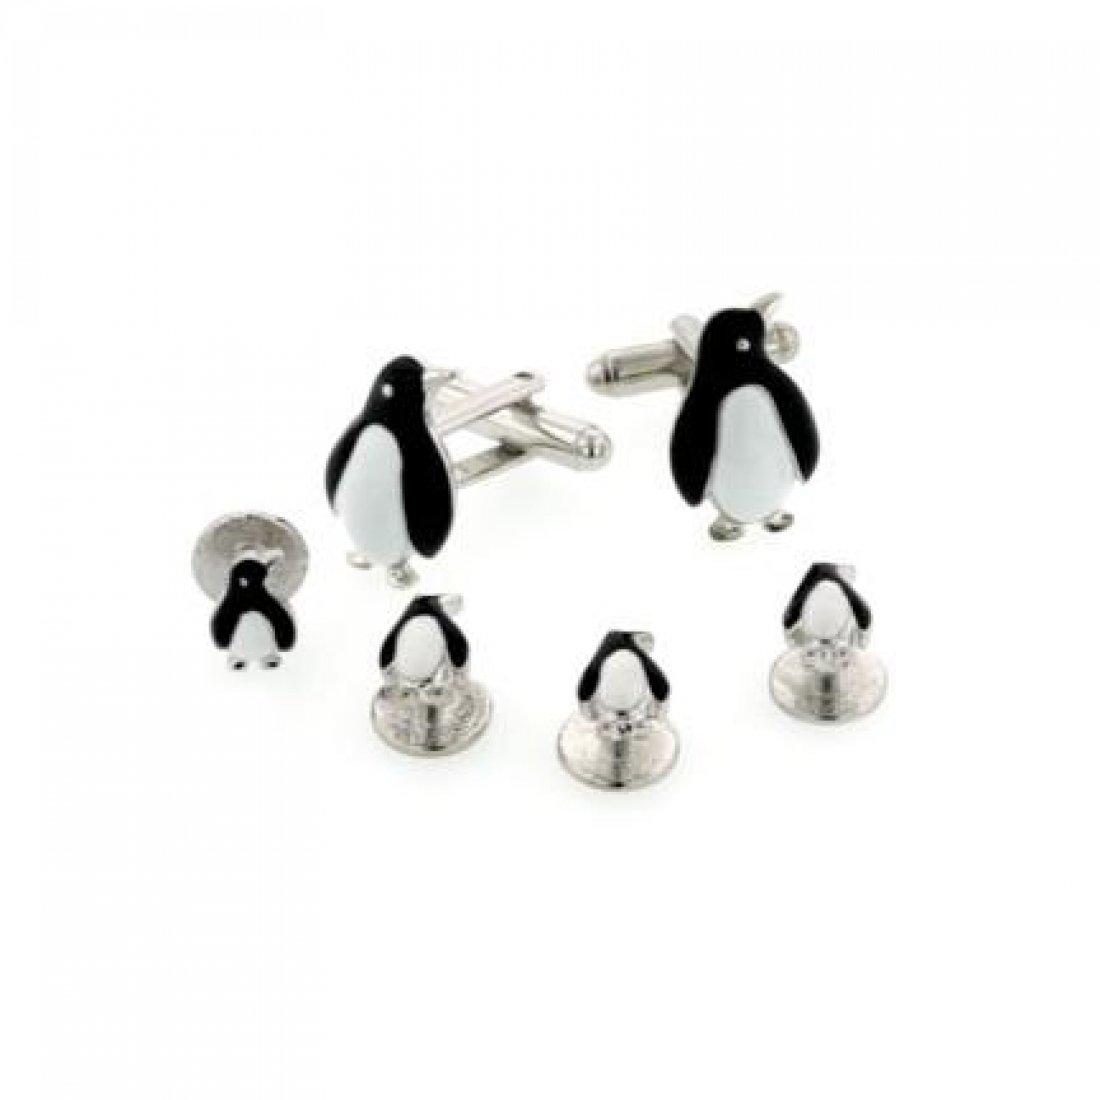 Black & White Penguins Tuxedo Studs and Cufflinks 18890